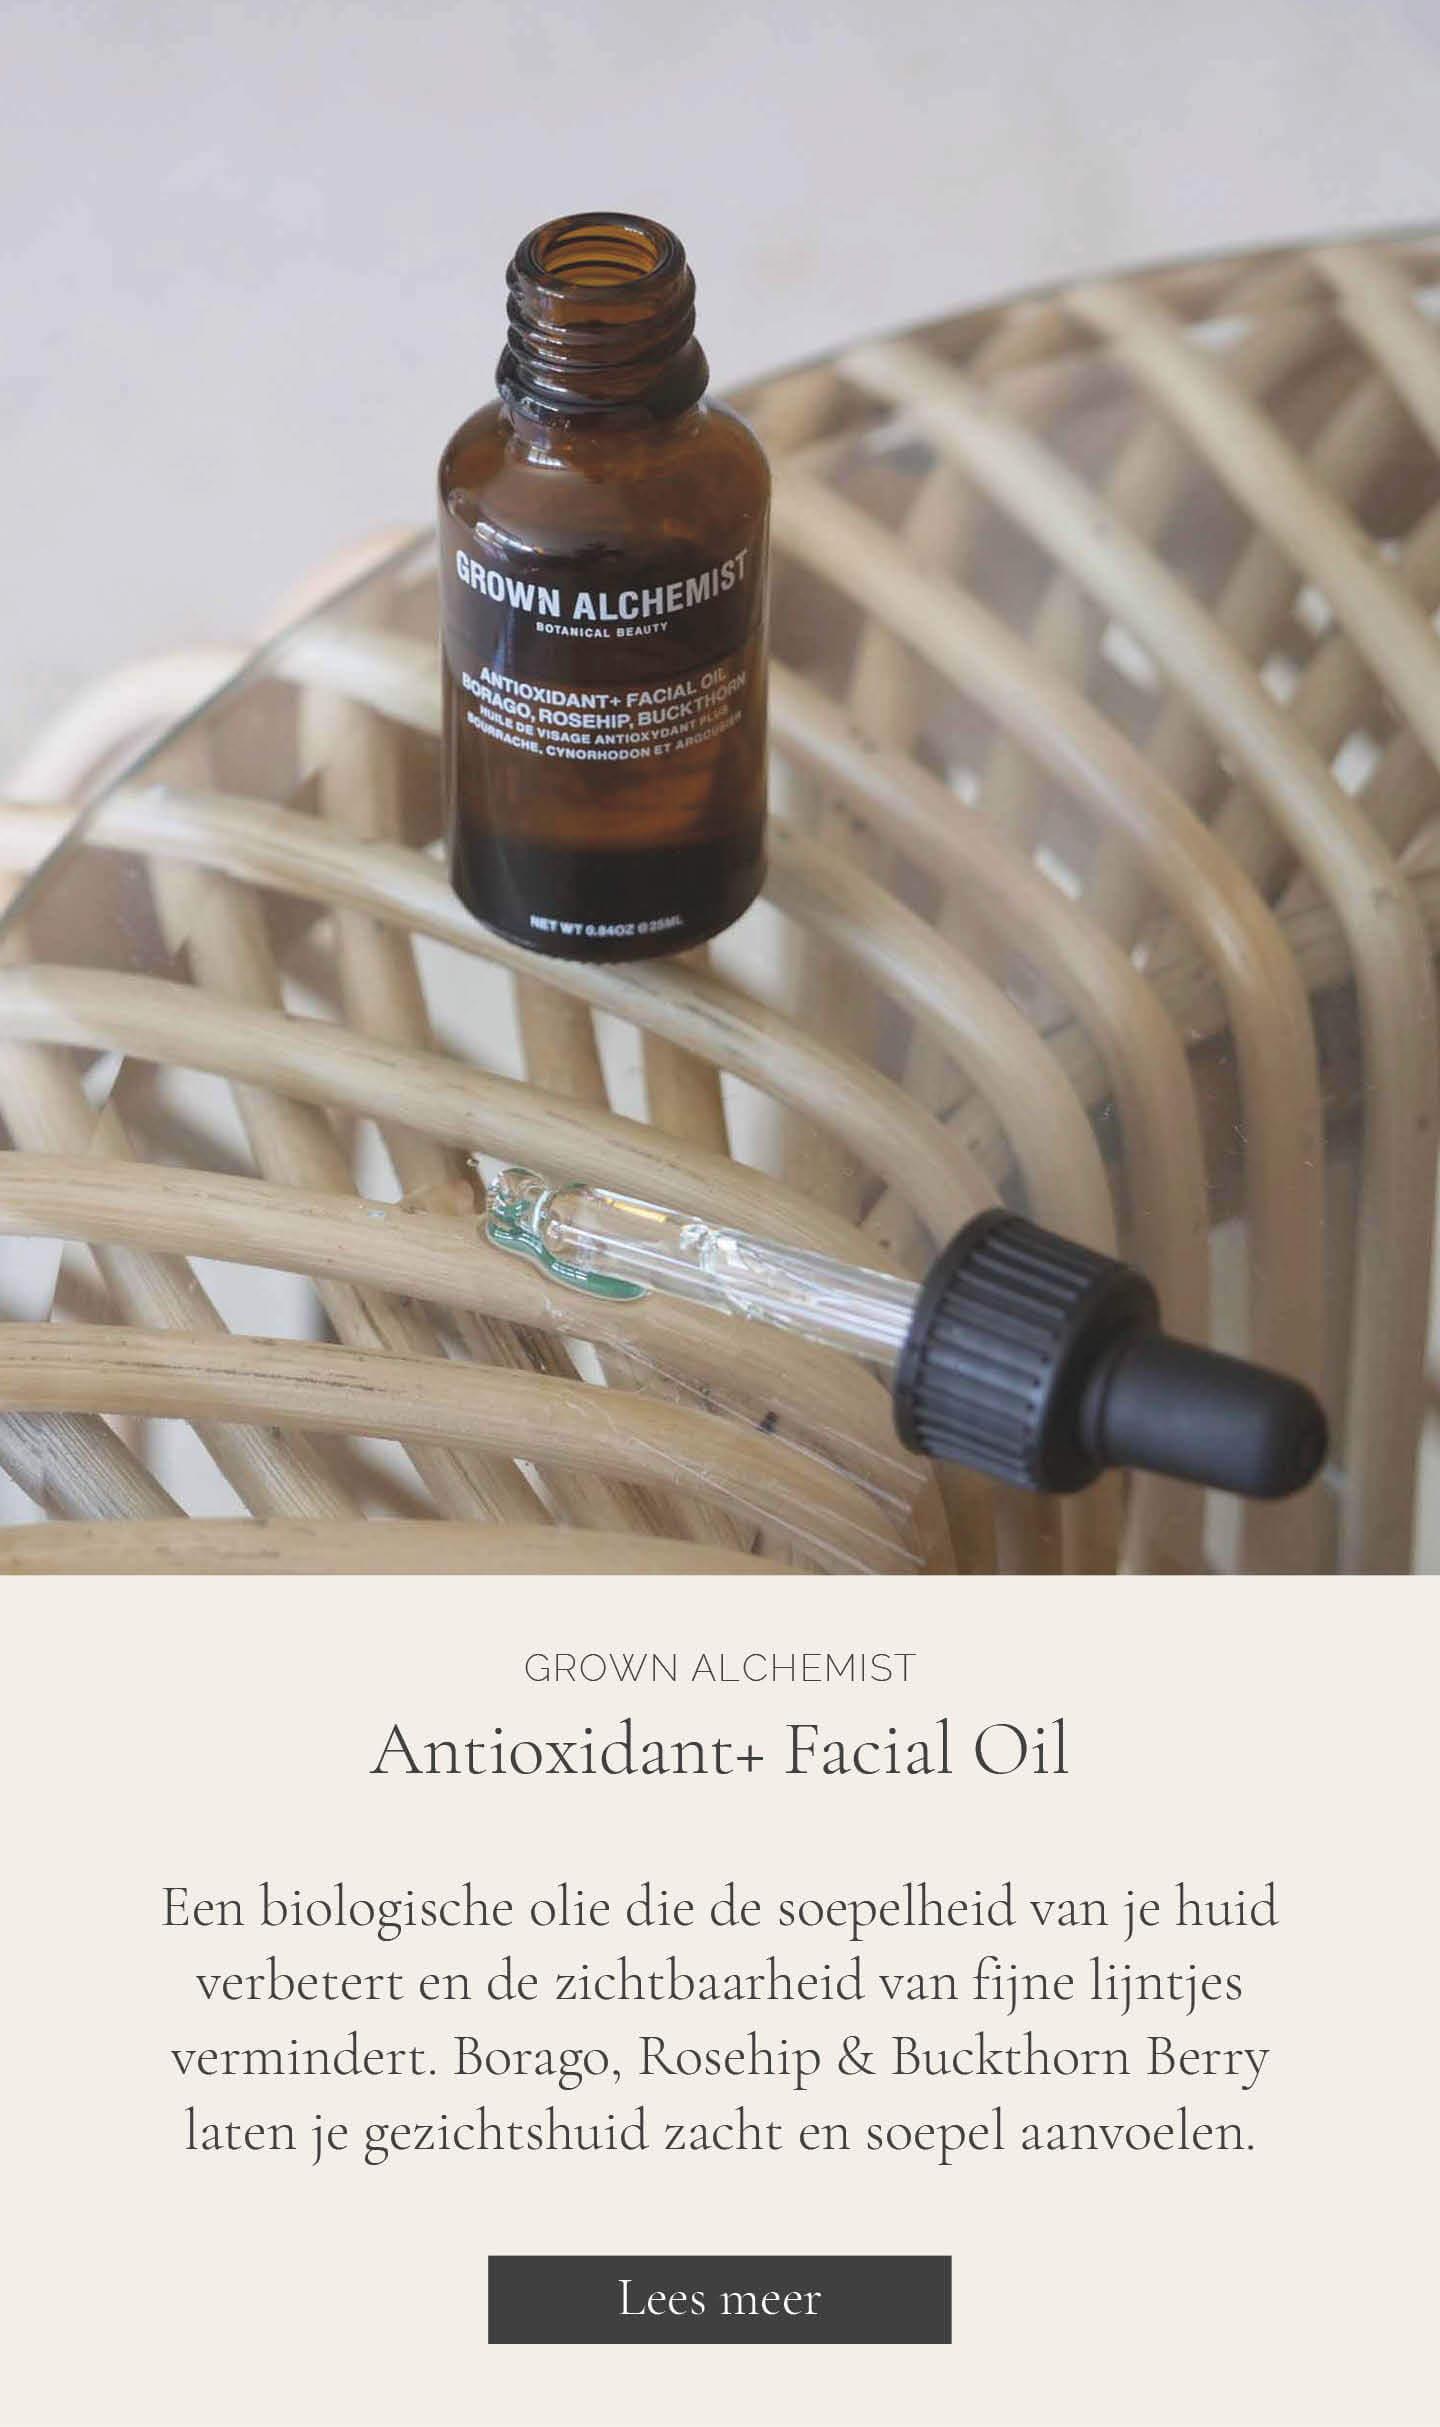 TWENTYTWONOTES | Grown Alchemist Antioxidant+ Facial Oil